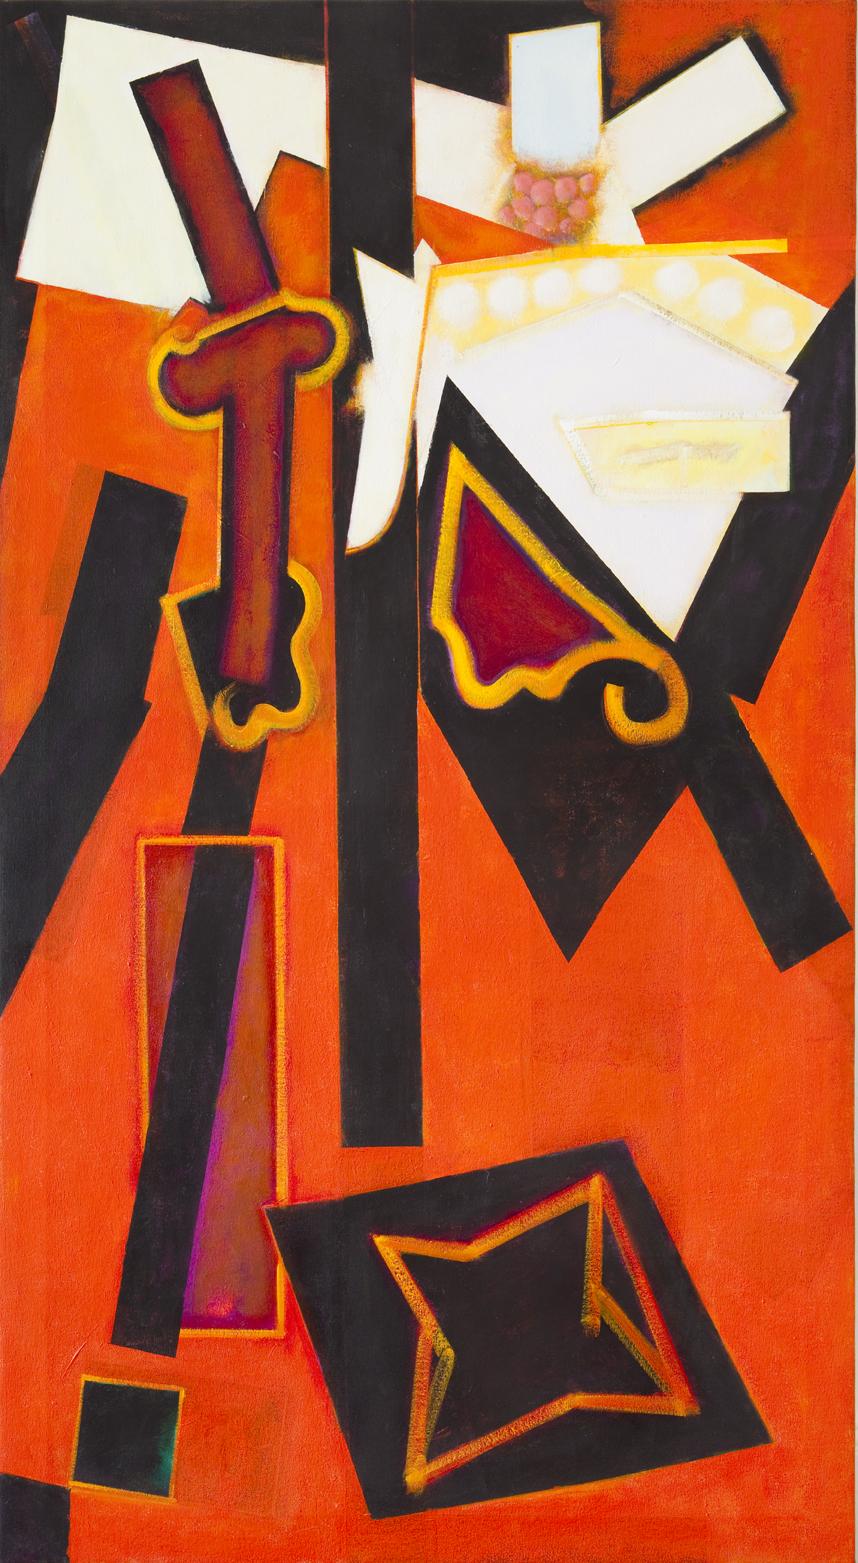 The Amorous Saints, 2011 Acrylic on canvas  69 x 39 1/2 inches